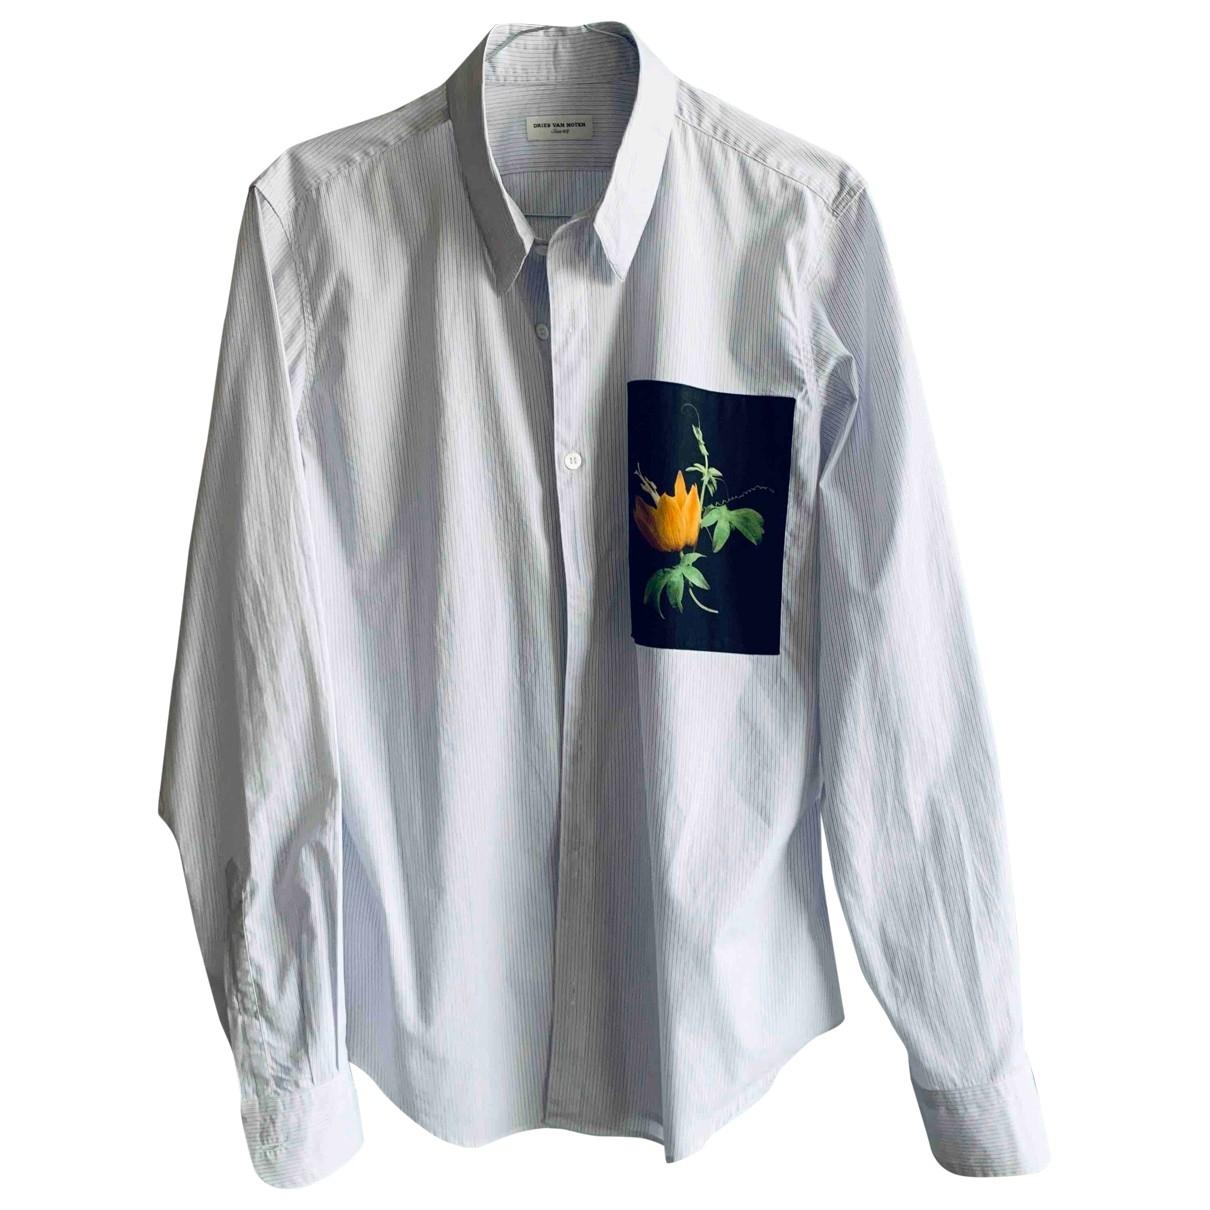 Dries Van Noten \N White Cotton Shirts for Men M International